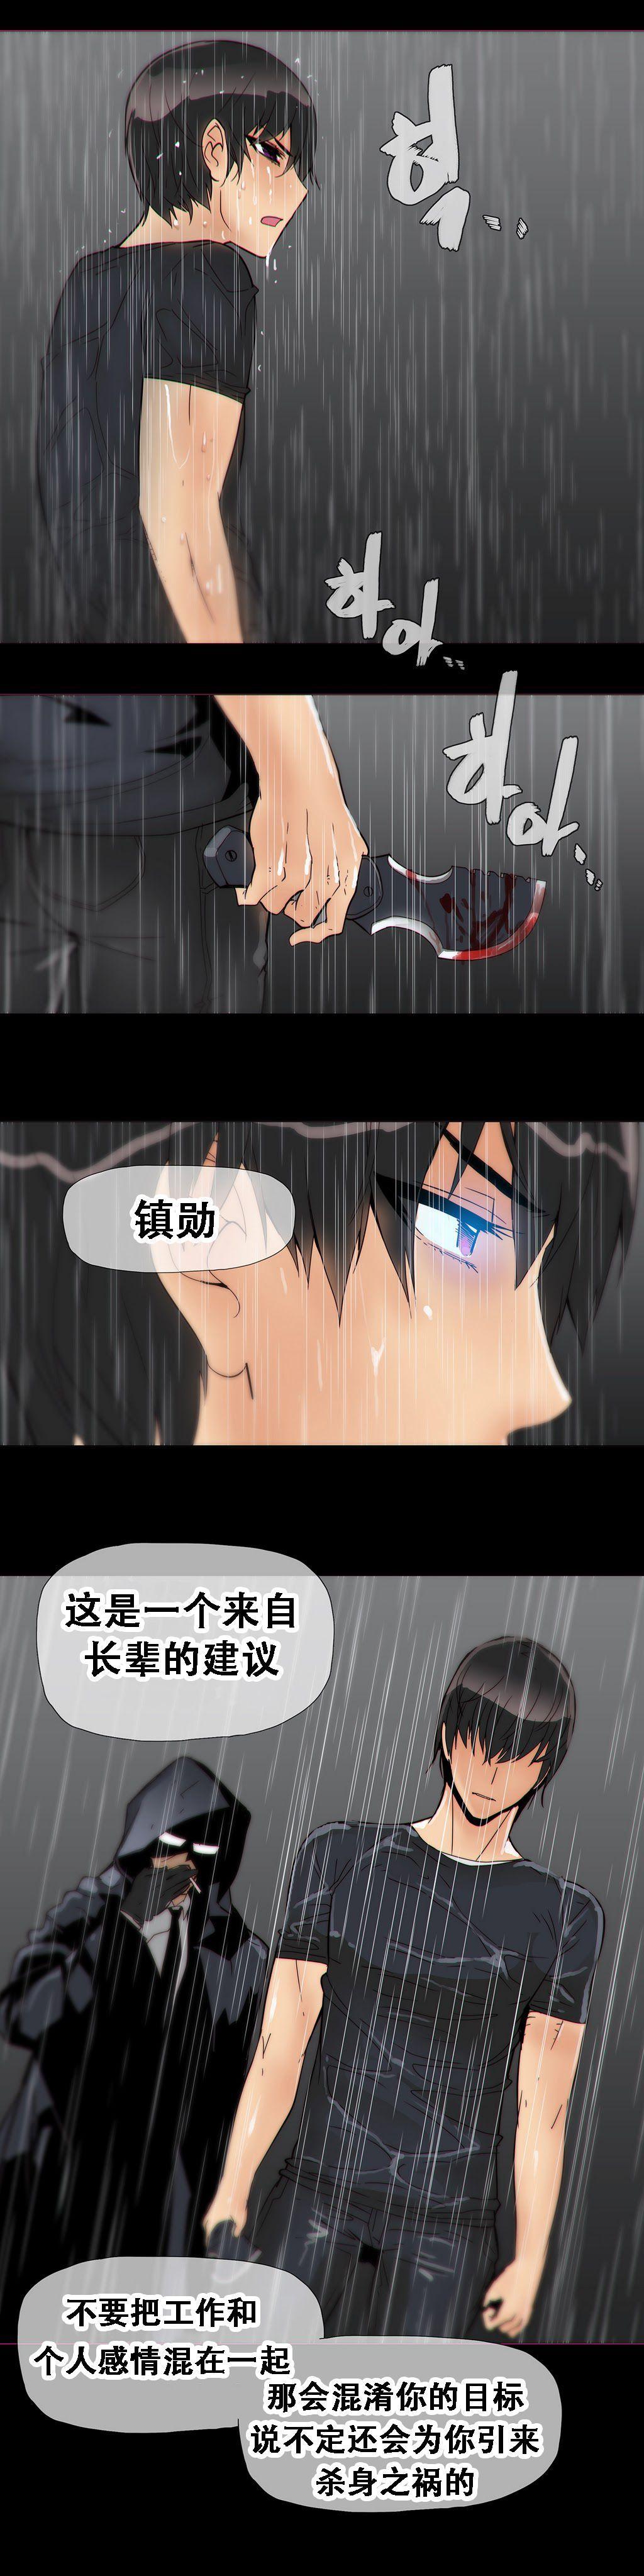 HouseHold Affairs 【卞赤鲤个人汉化】1~33话(持续更新中) 347